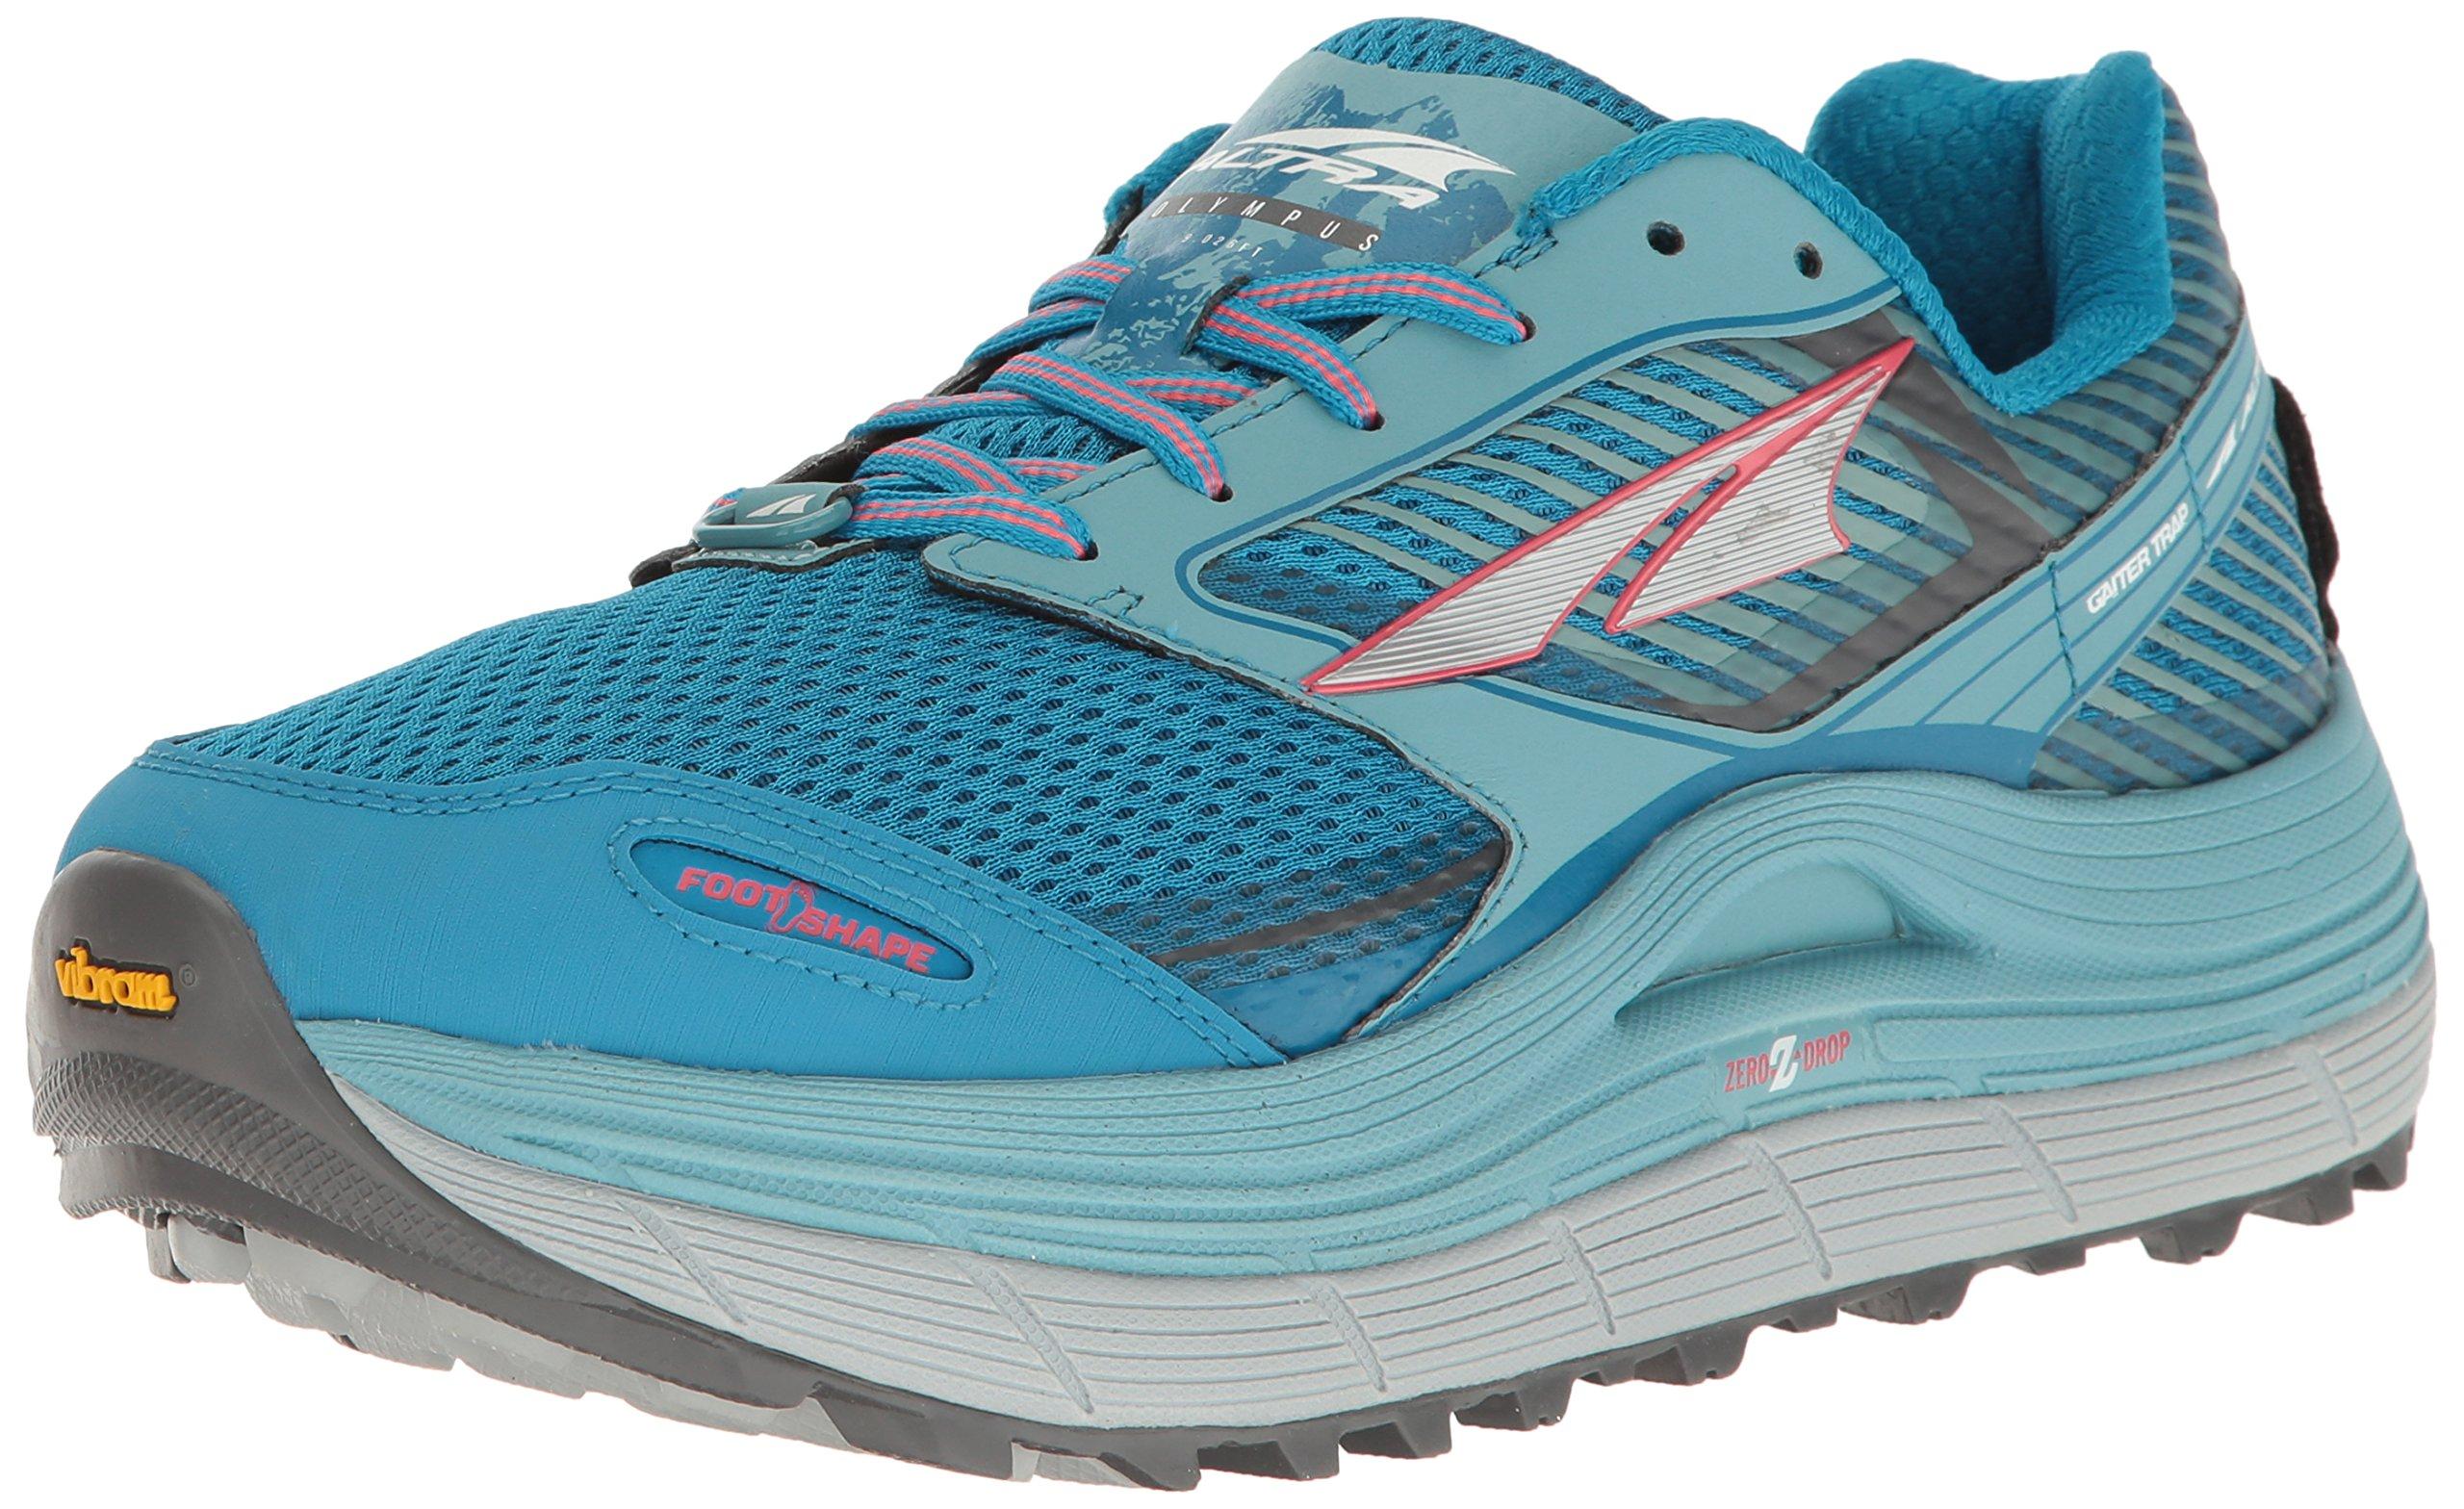 Altra Olympus 2.5 Women's Trail Running Shoe, Blue, 8